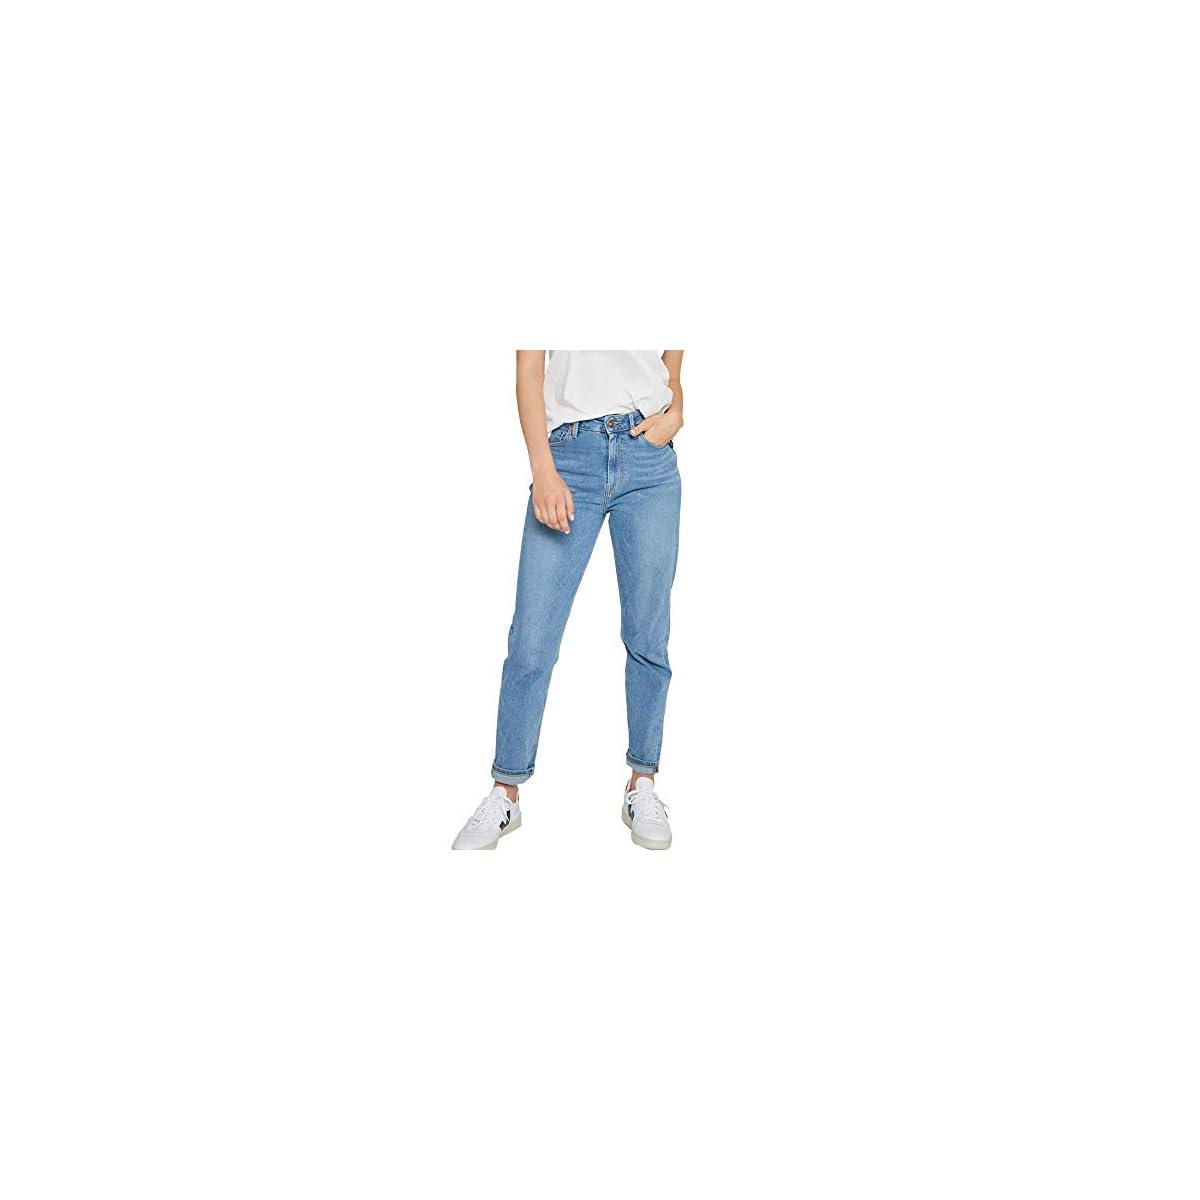 Kuyichi Damen Jeans Nora Bio-Baumwolle Faded Blau